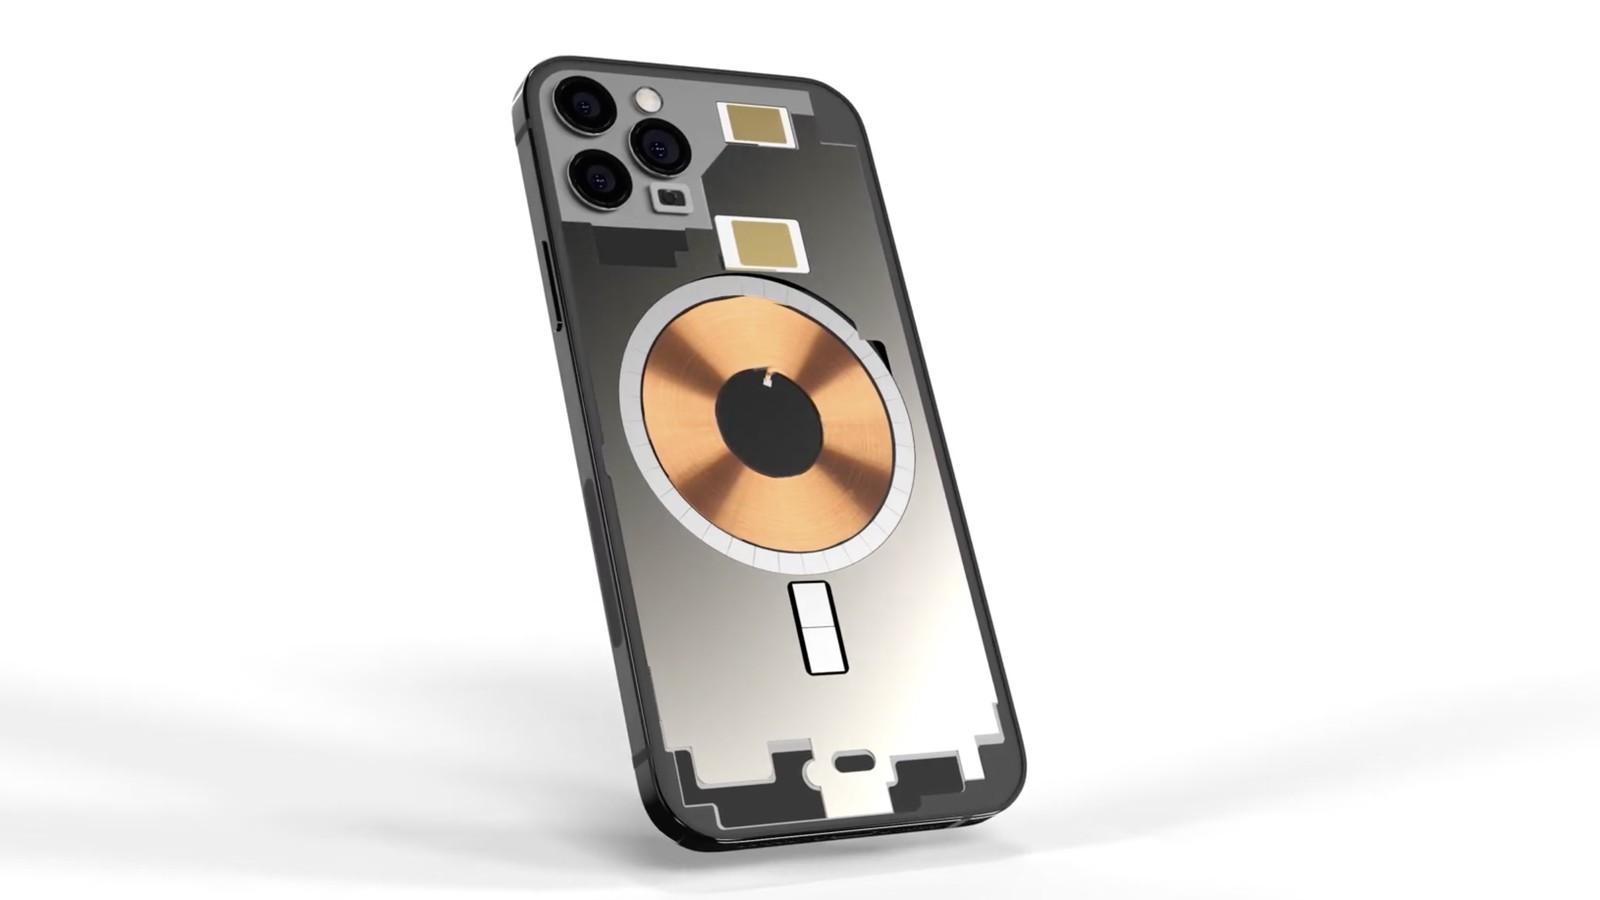 iPhone-13-cewka-ladujaca